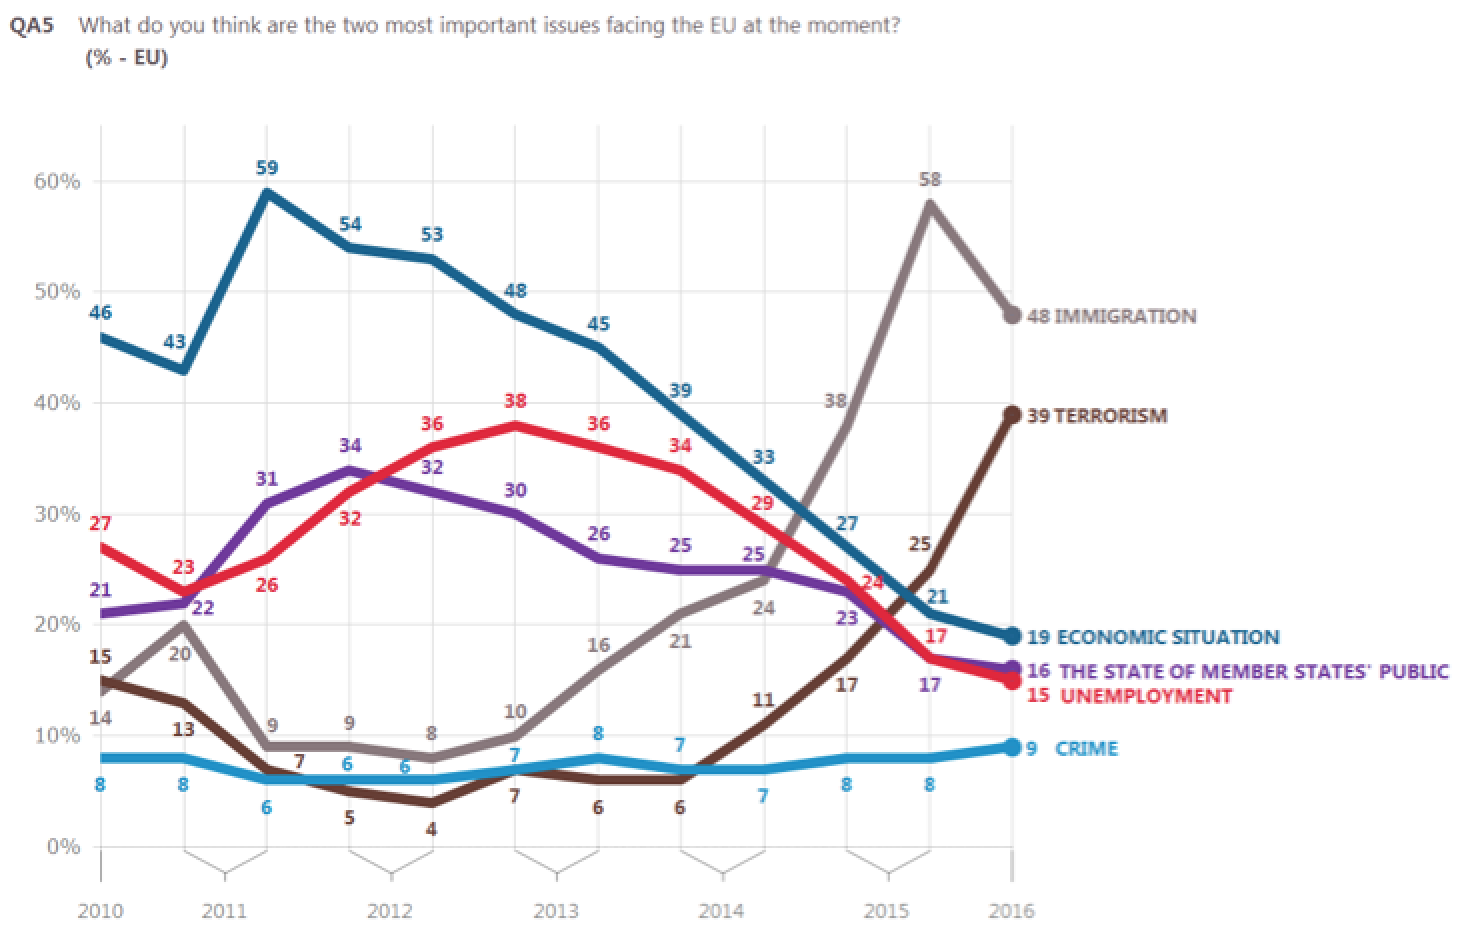 Euro-barometer 2016: public opinion polls